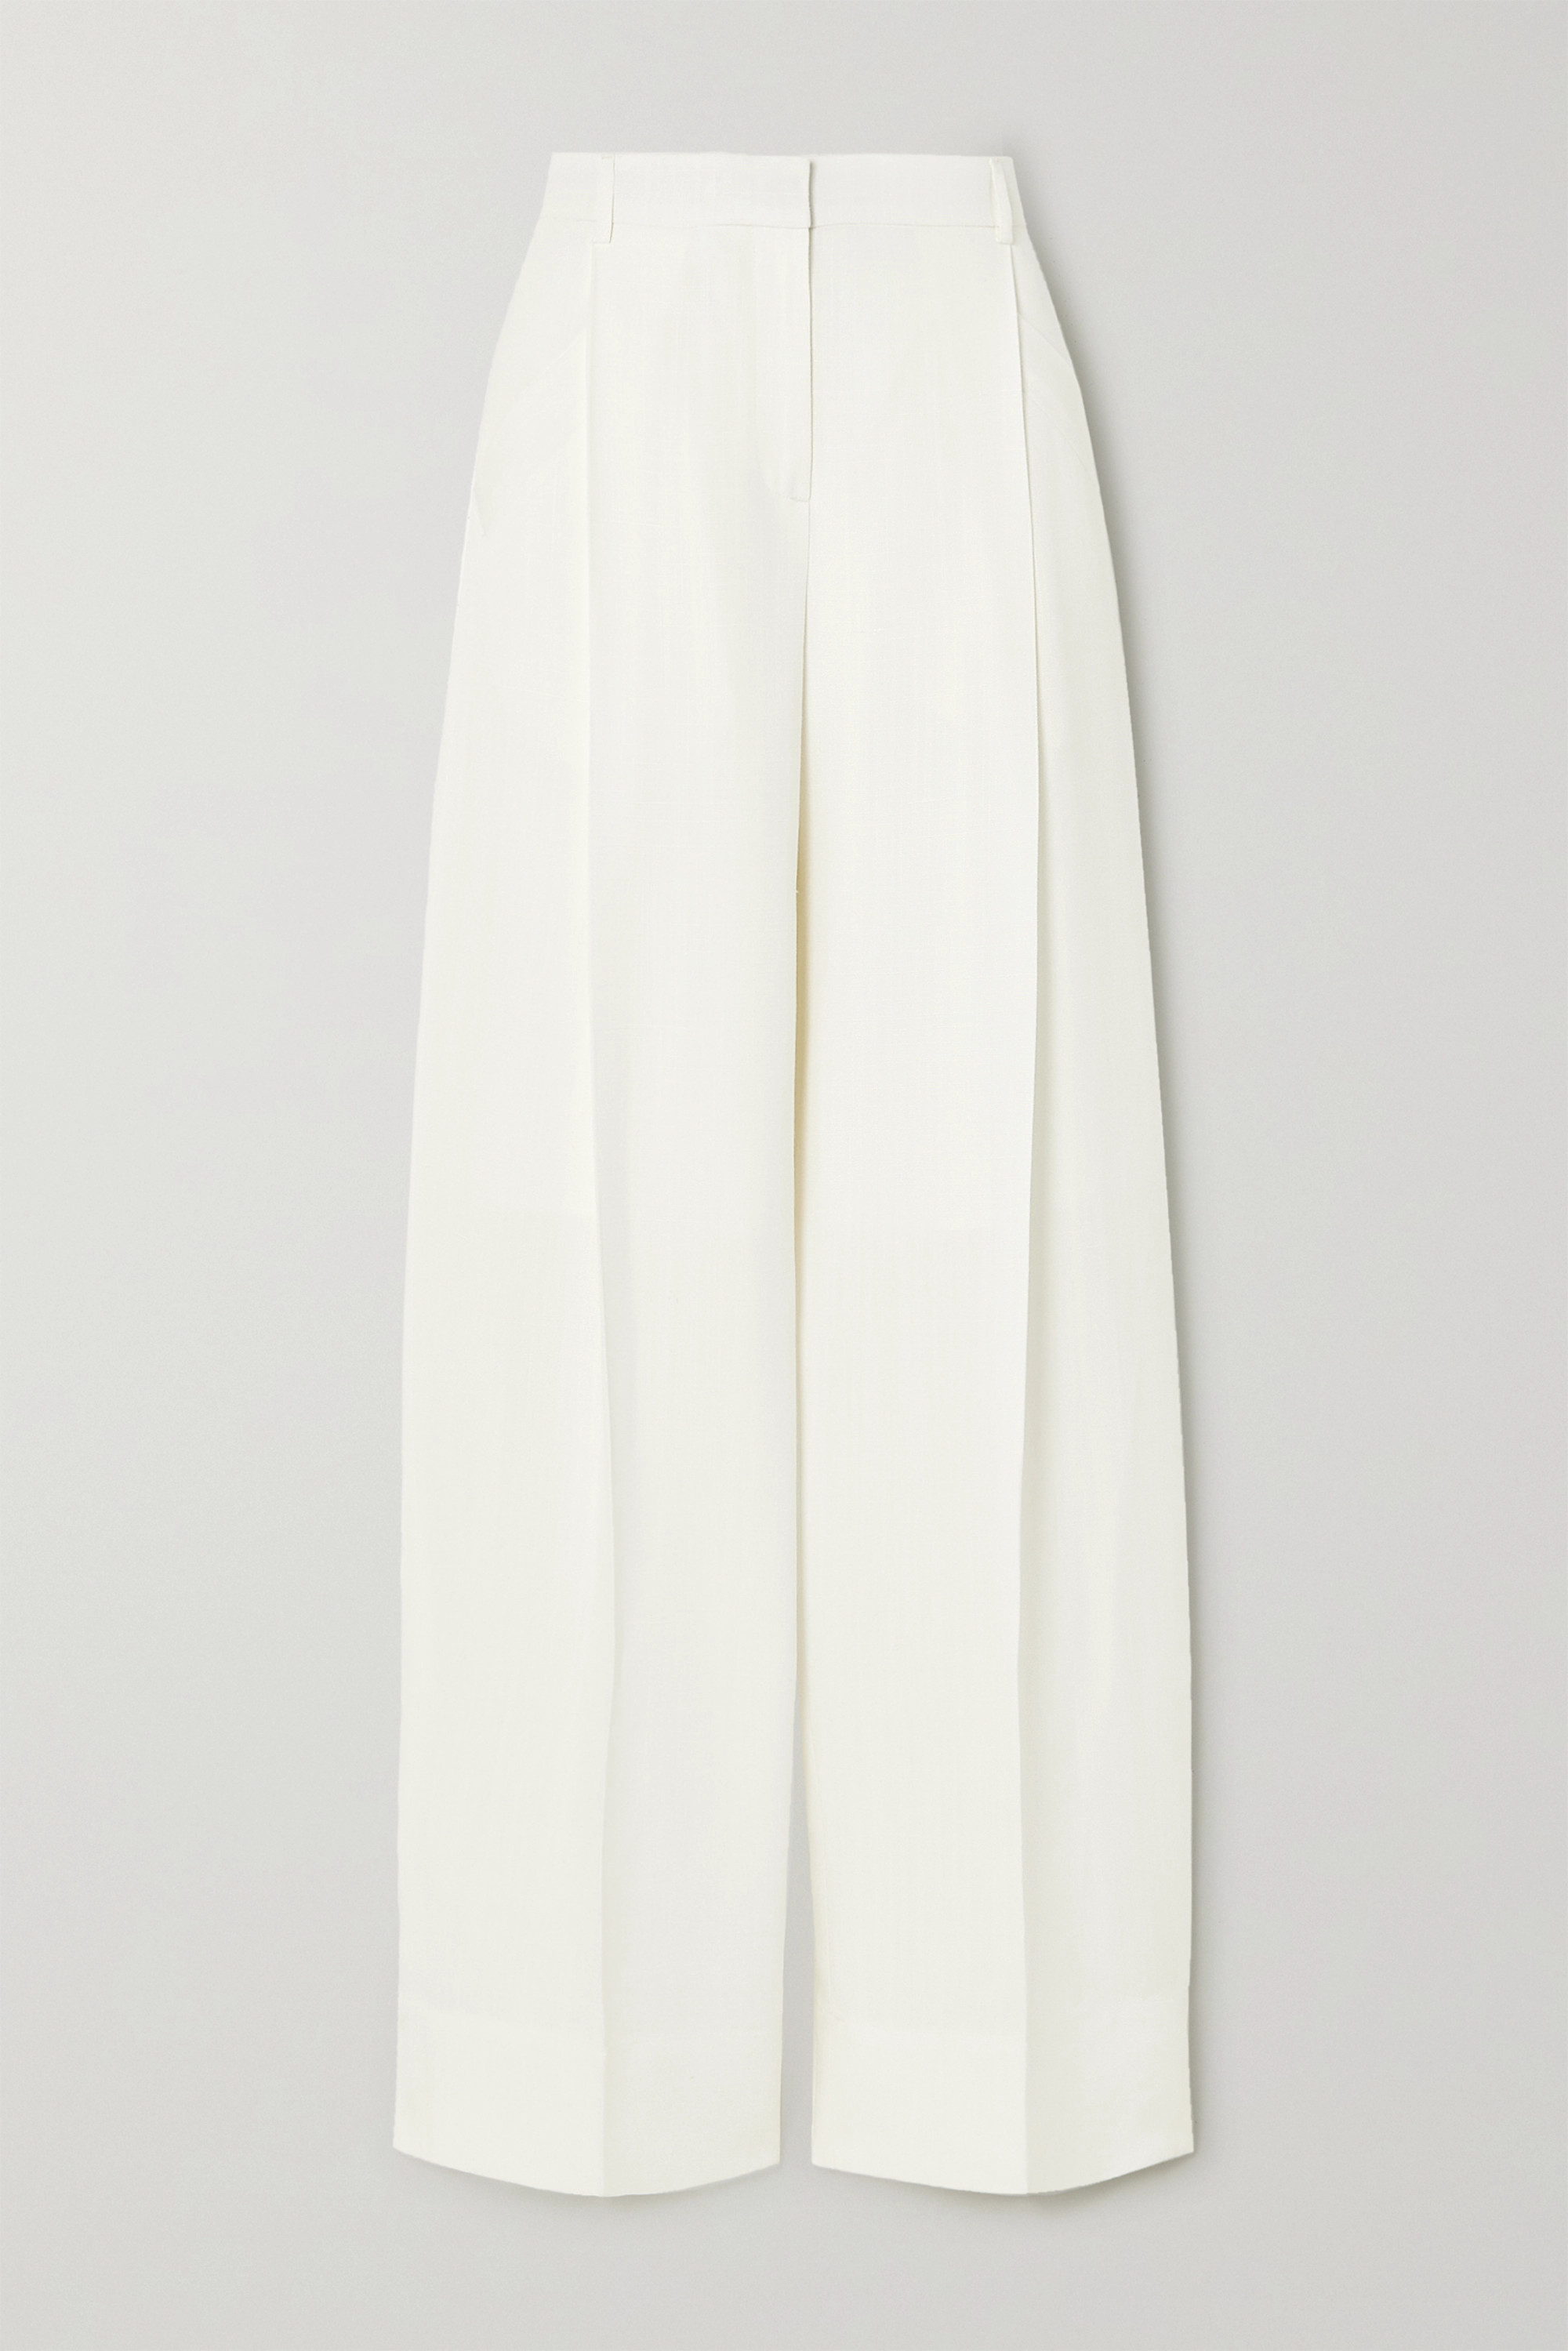 Jacquemus Loya woven pants